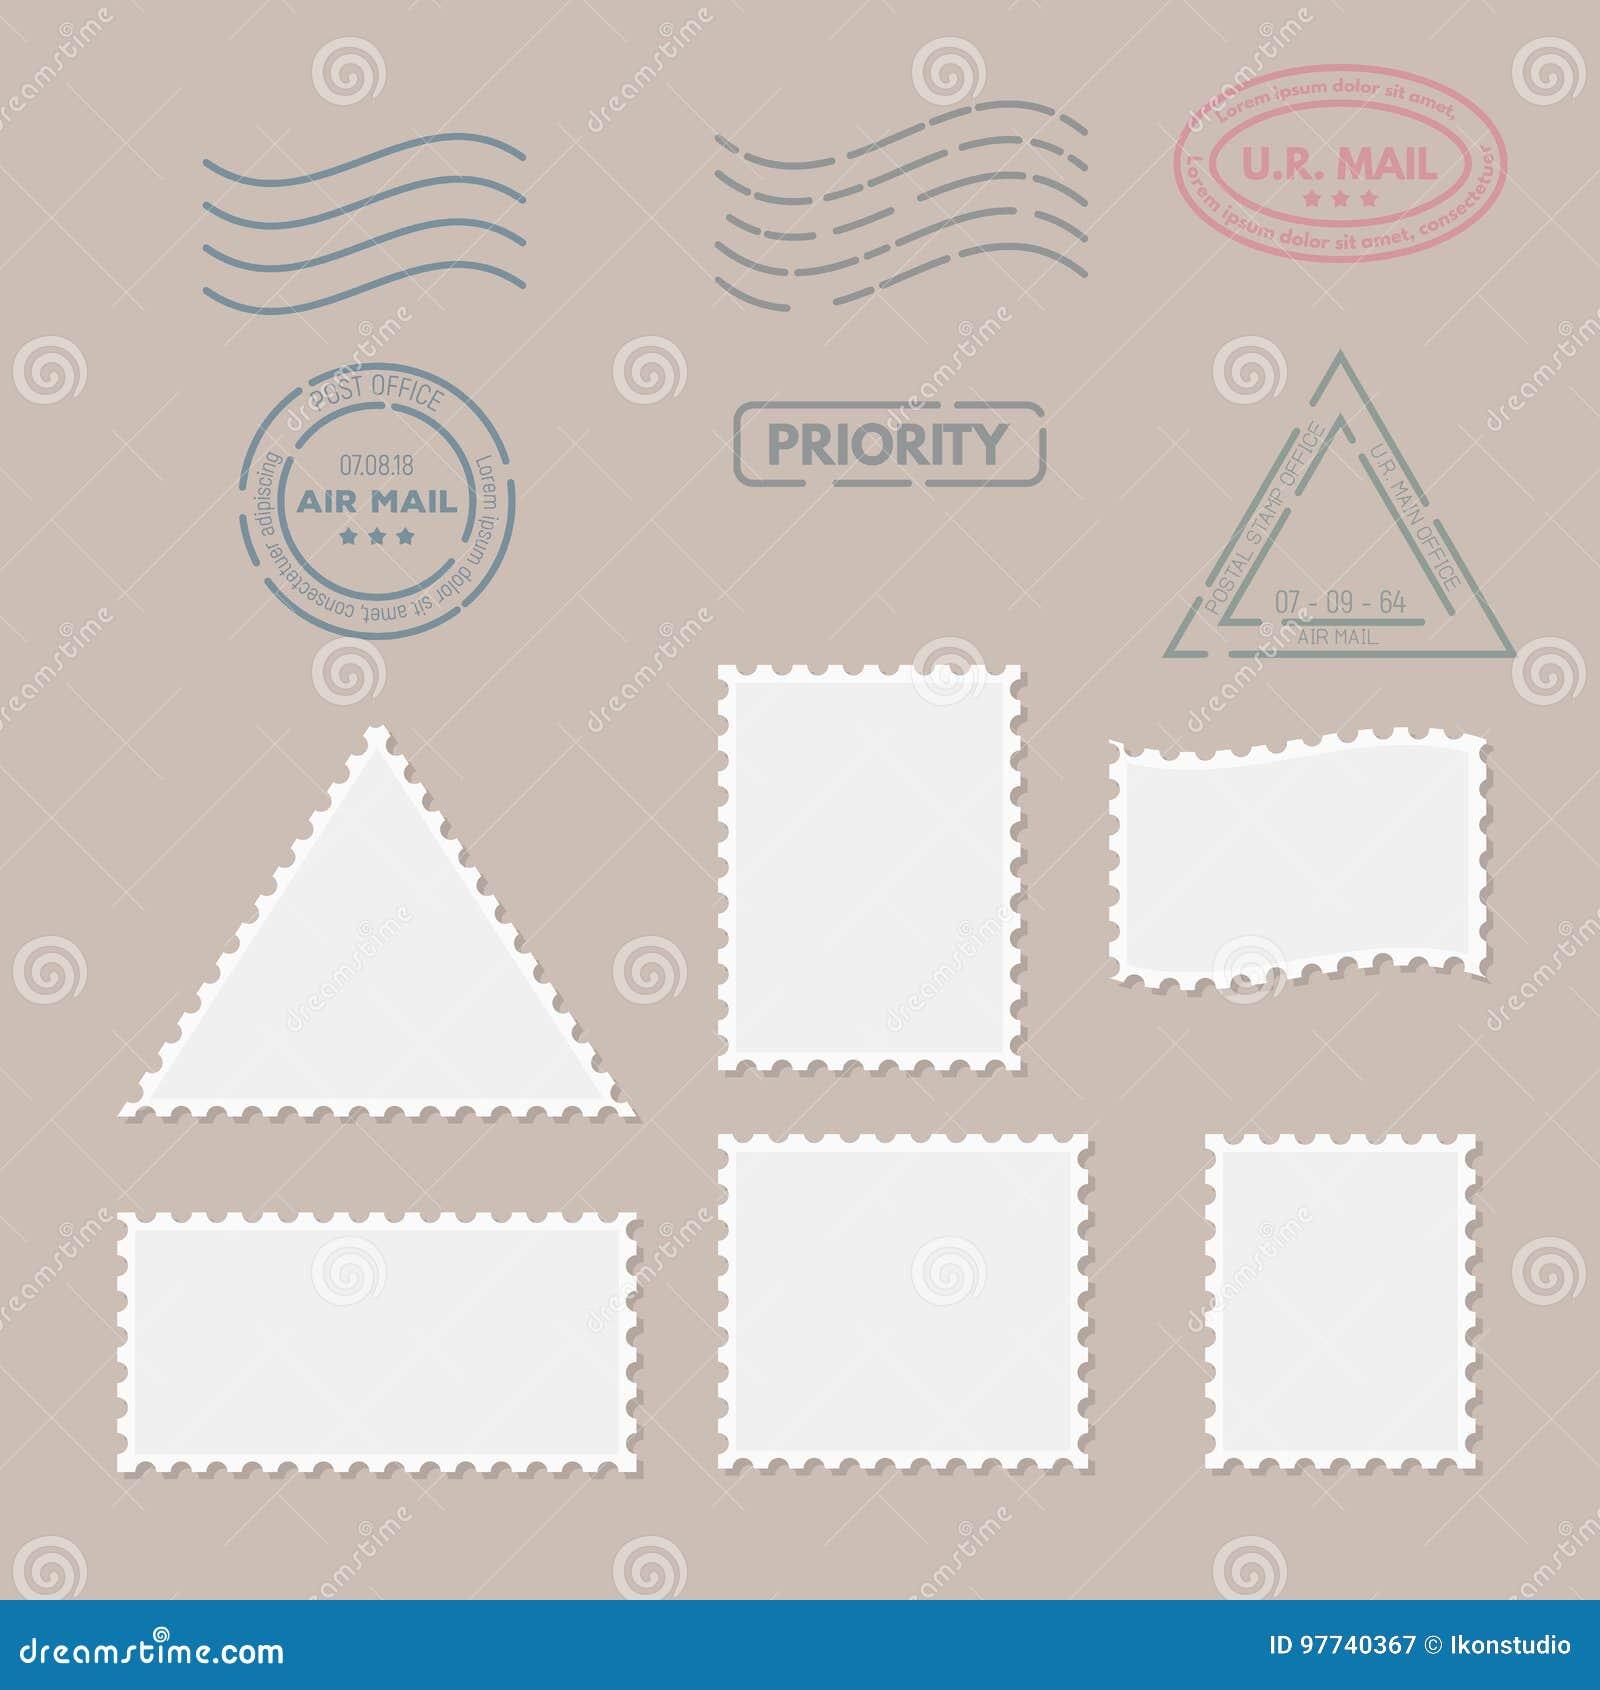 postage stamps for postcard stock vector illustration of envelope